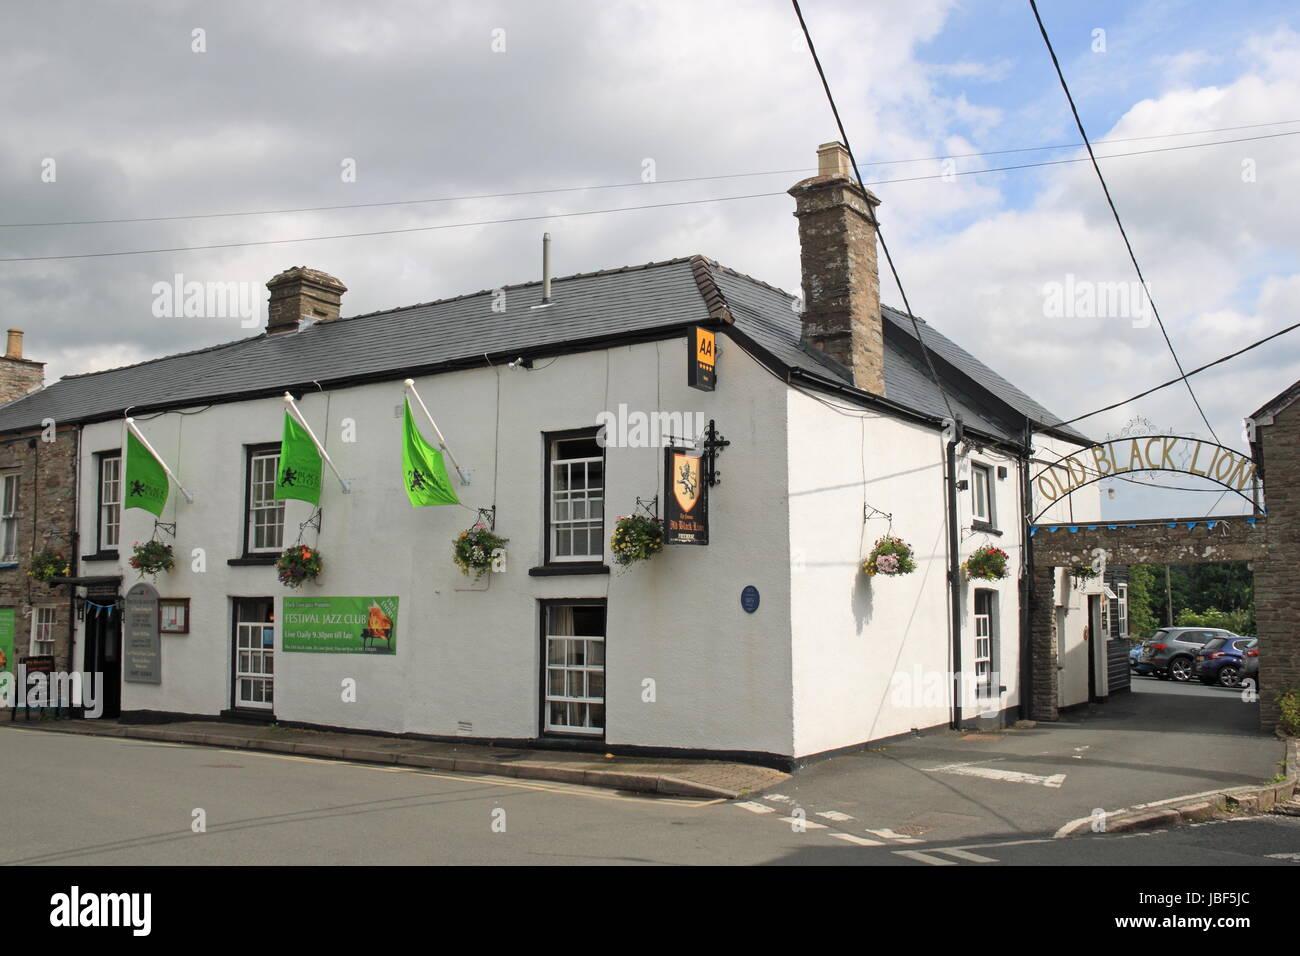 Old Black Lion pub, Lion Street, Hay-on-Wye, Brecknockshire, Powys, Wales, Great Britain, United Kingdom, UK, Europe - Stock Image